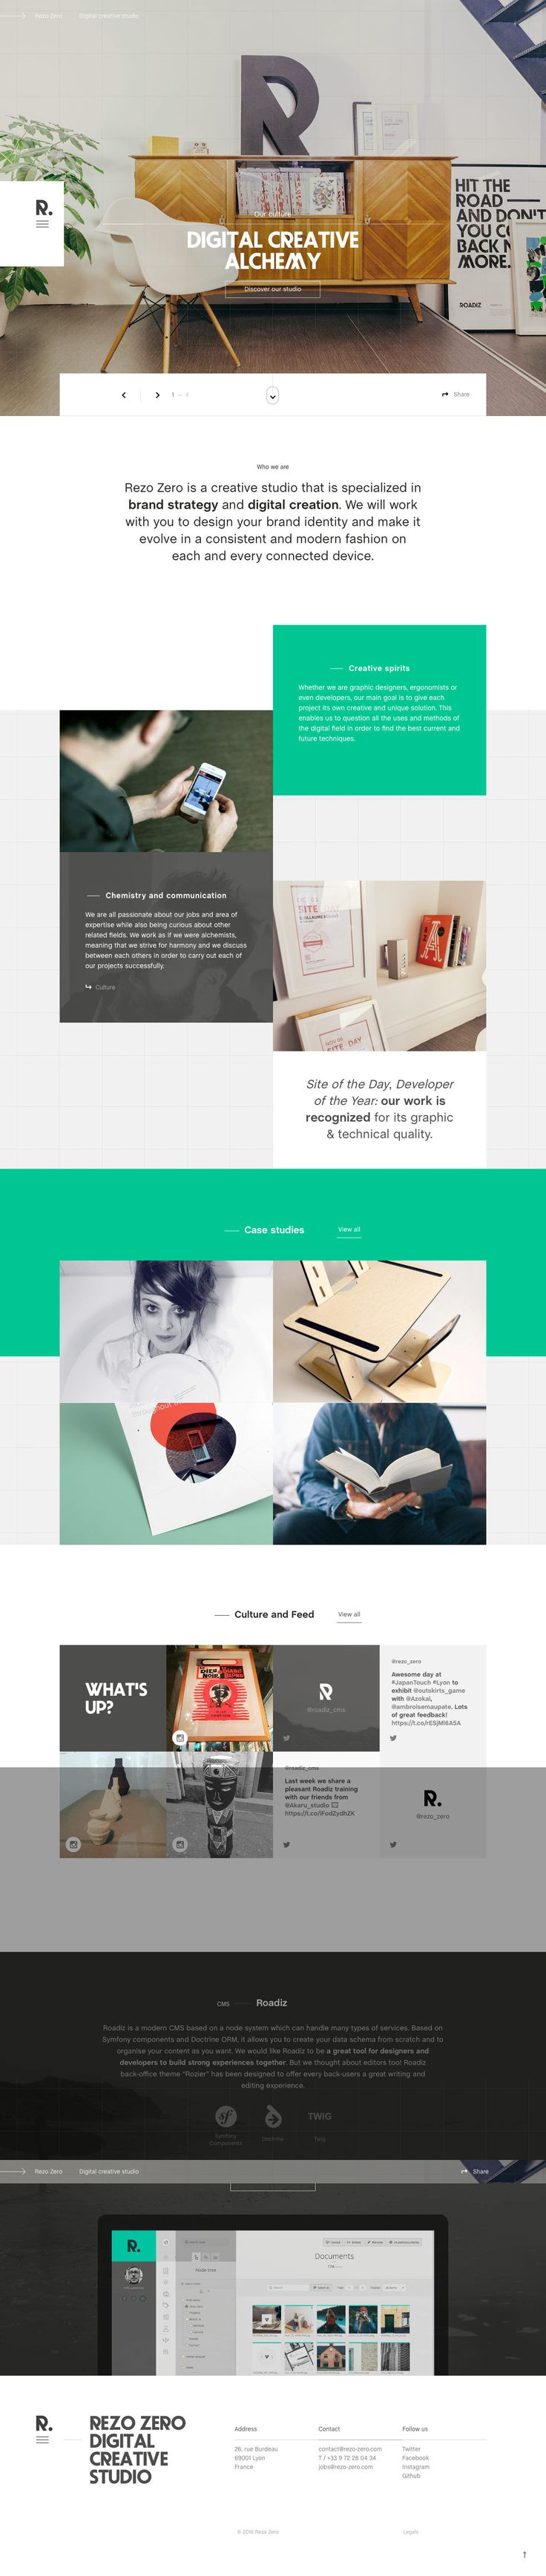 Rezo Zero (More web design inspiration at topdesigninspiration.com) #design #web #webdesign #inspiration #sitedesign #responsive